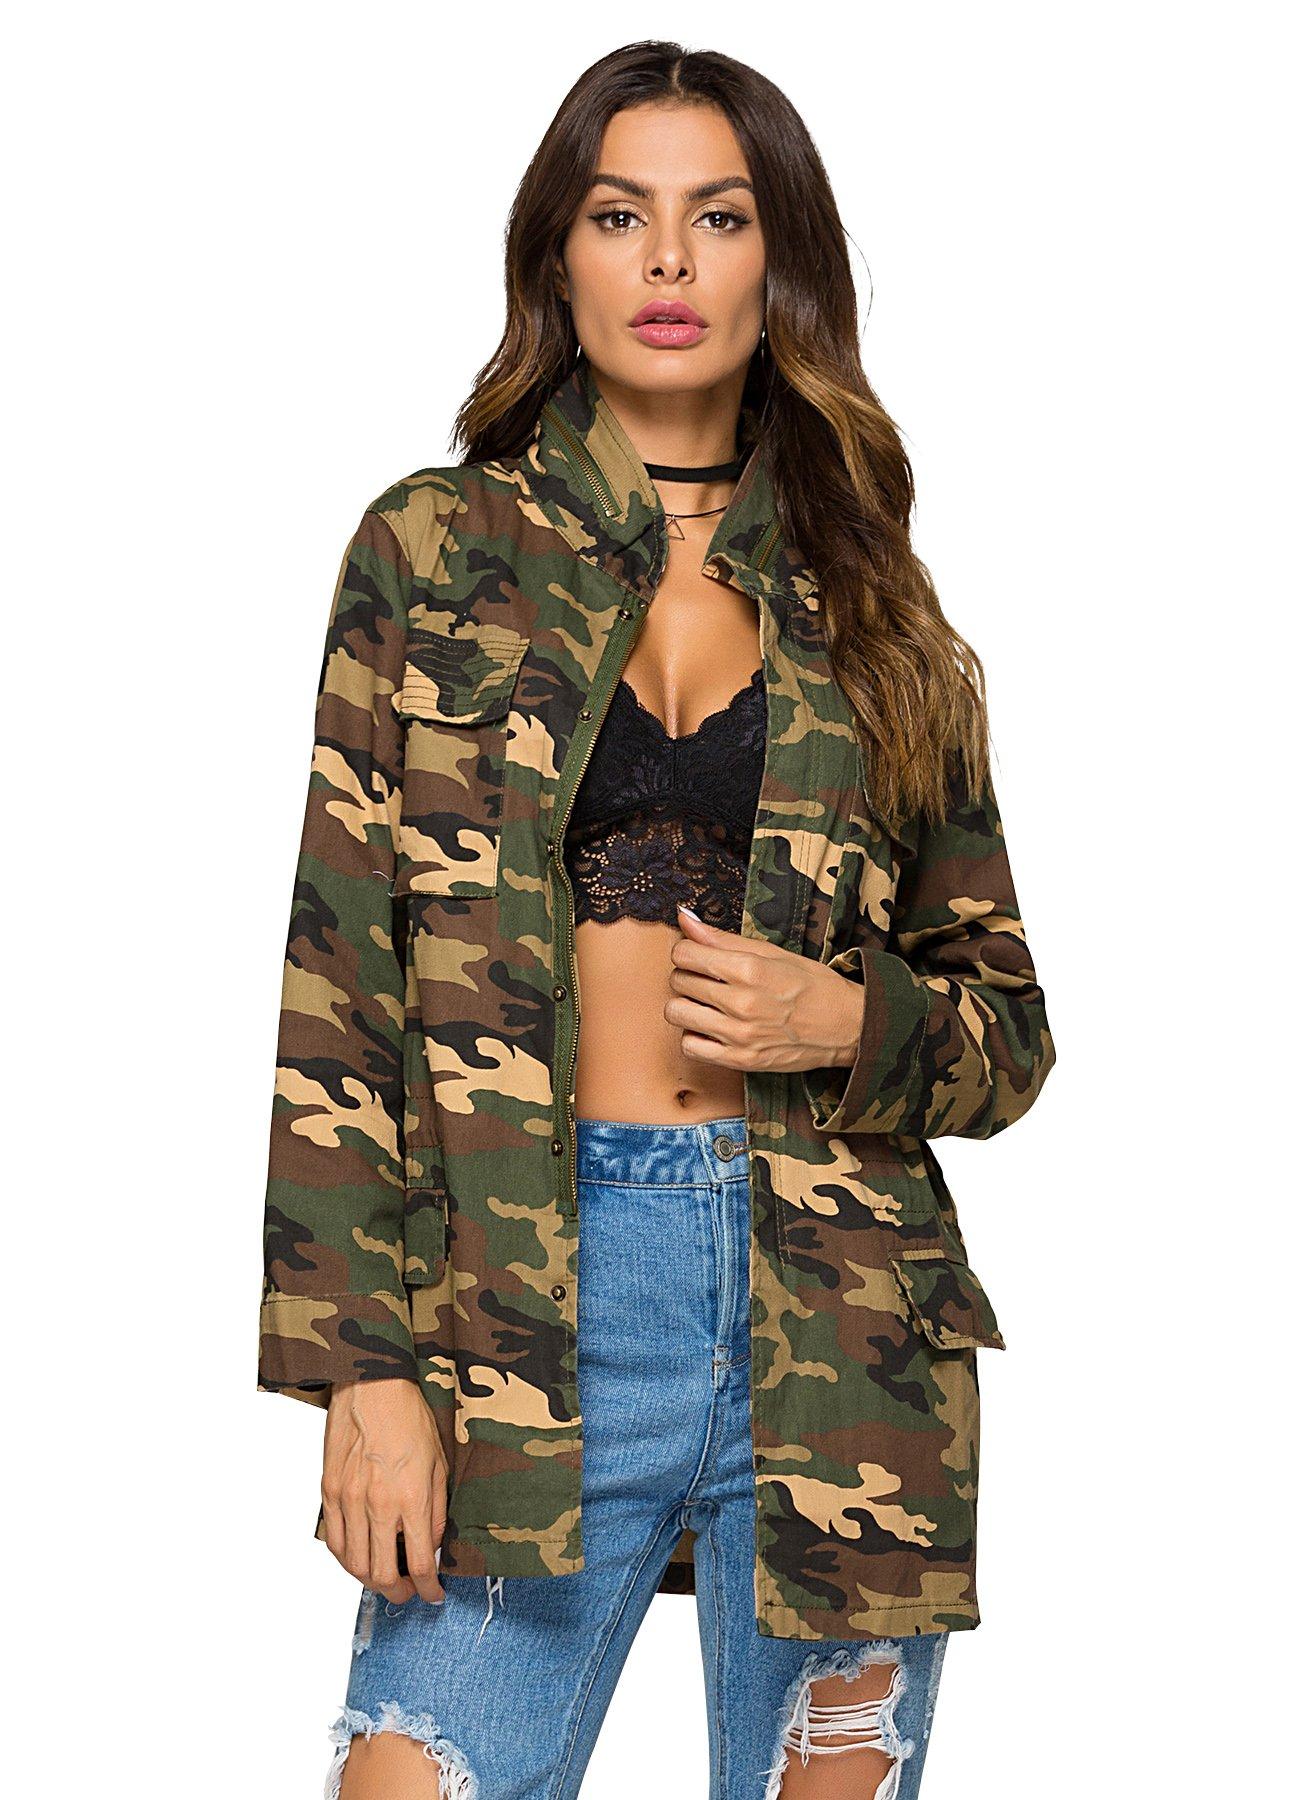 Escalier Women`s Military Camo Jacket Zipper Causal Camoflage Utility Coat Camo L